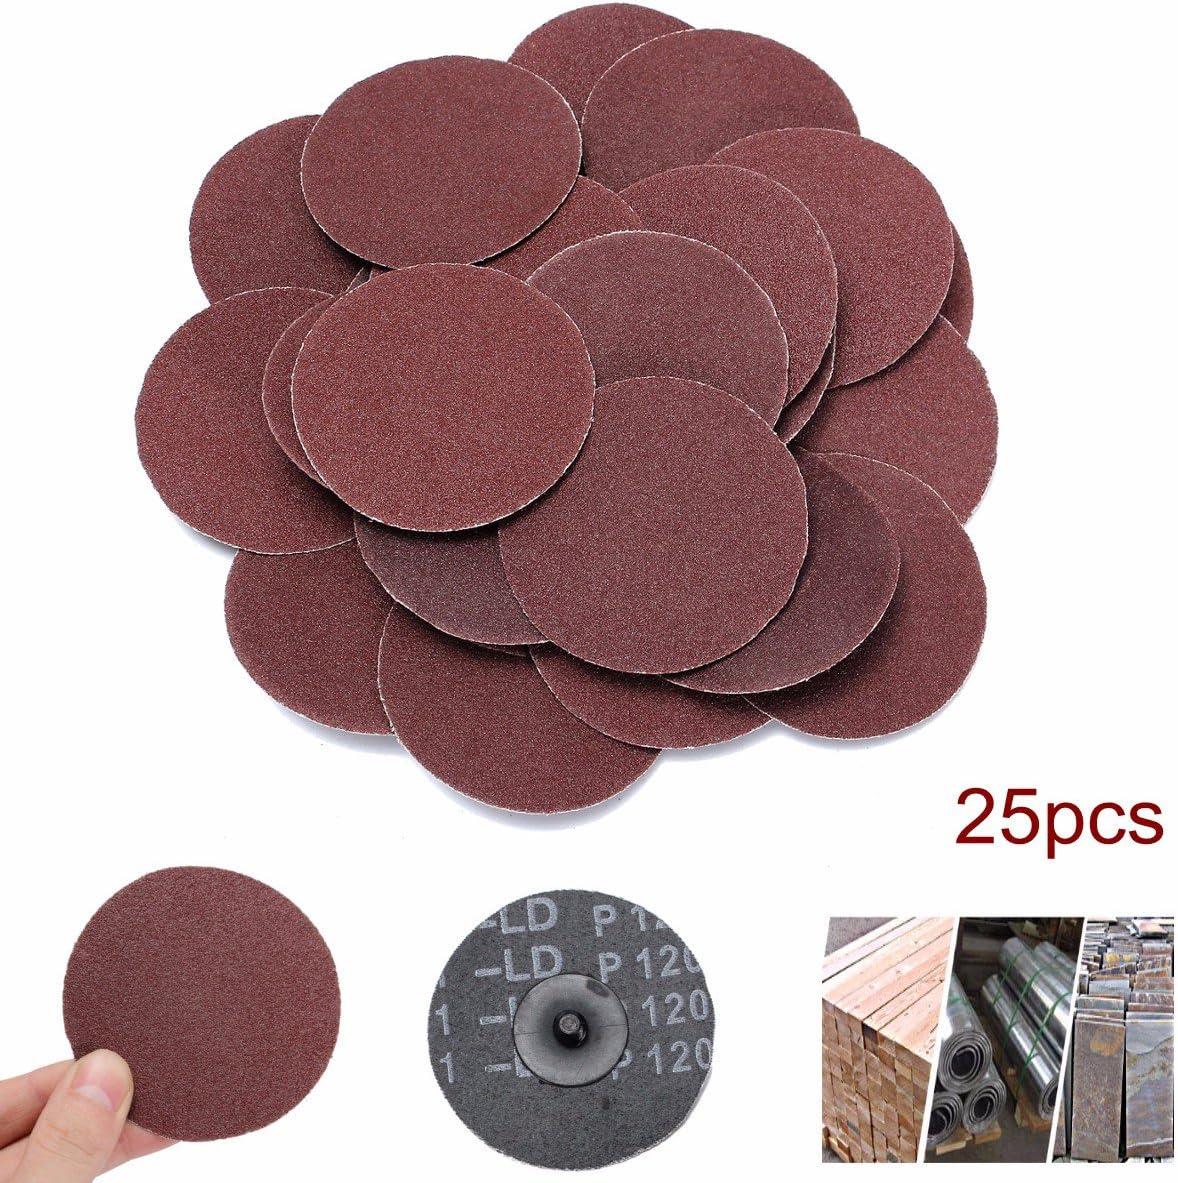 Jeteven 3 Inch Roll Lock Sanding Discs Sandpaper Grinding Disc Change Discs 25 PCS Abrasive Paper for Die Grinder 120 Grit